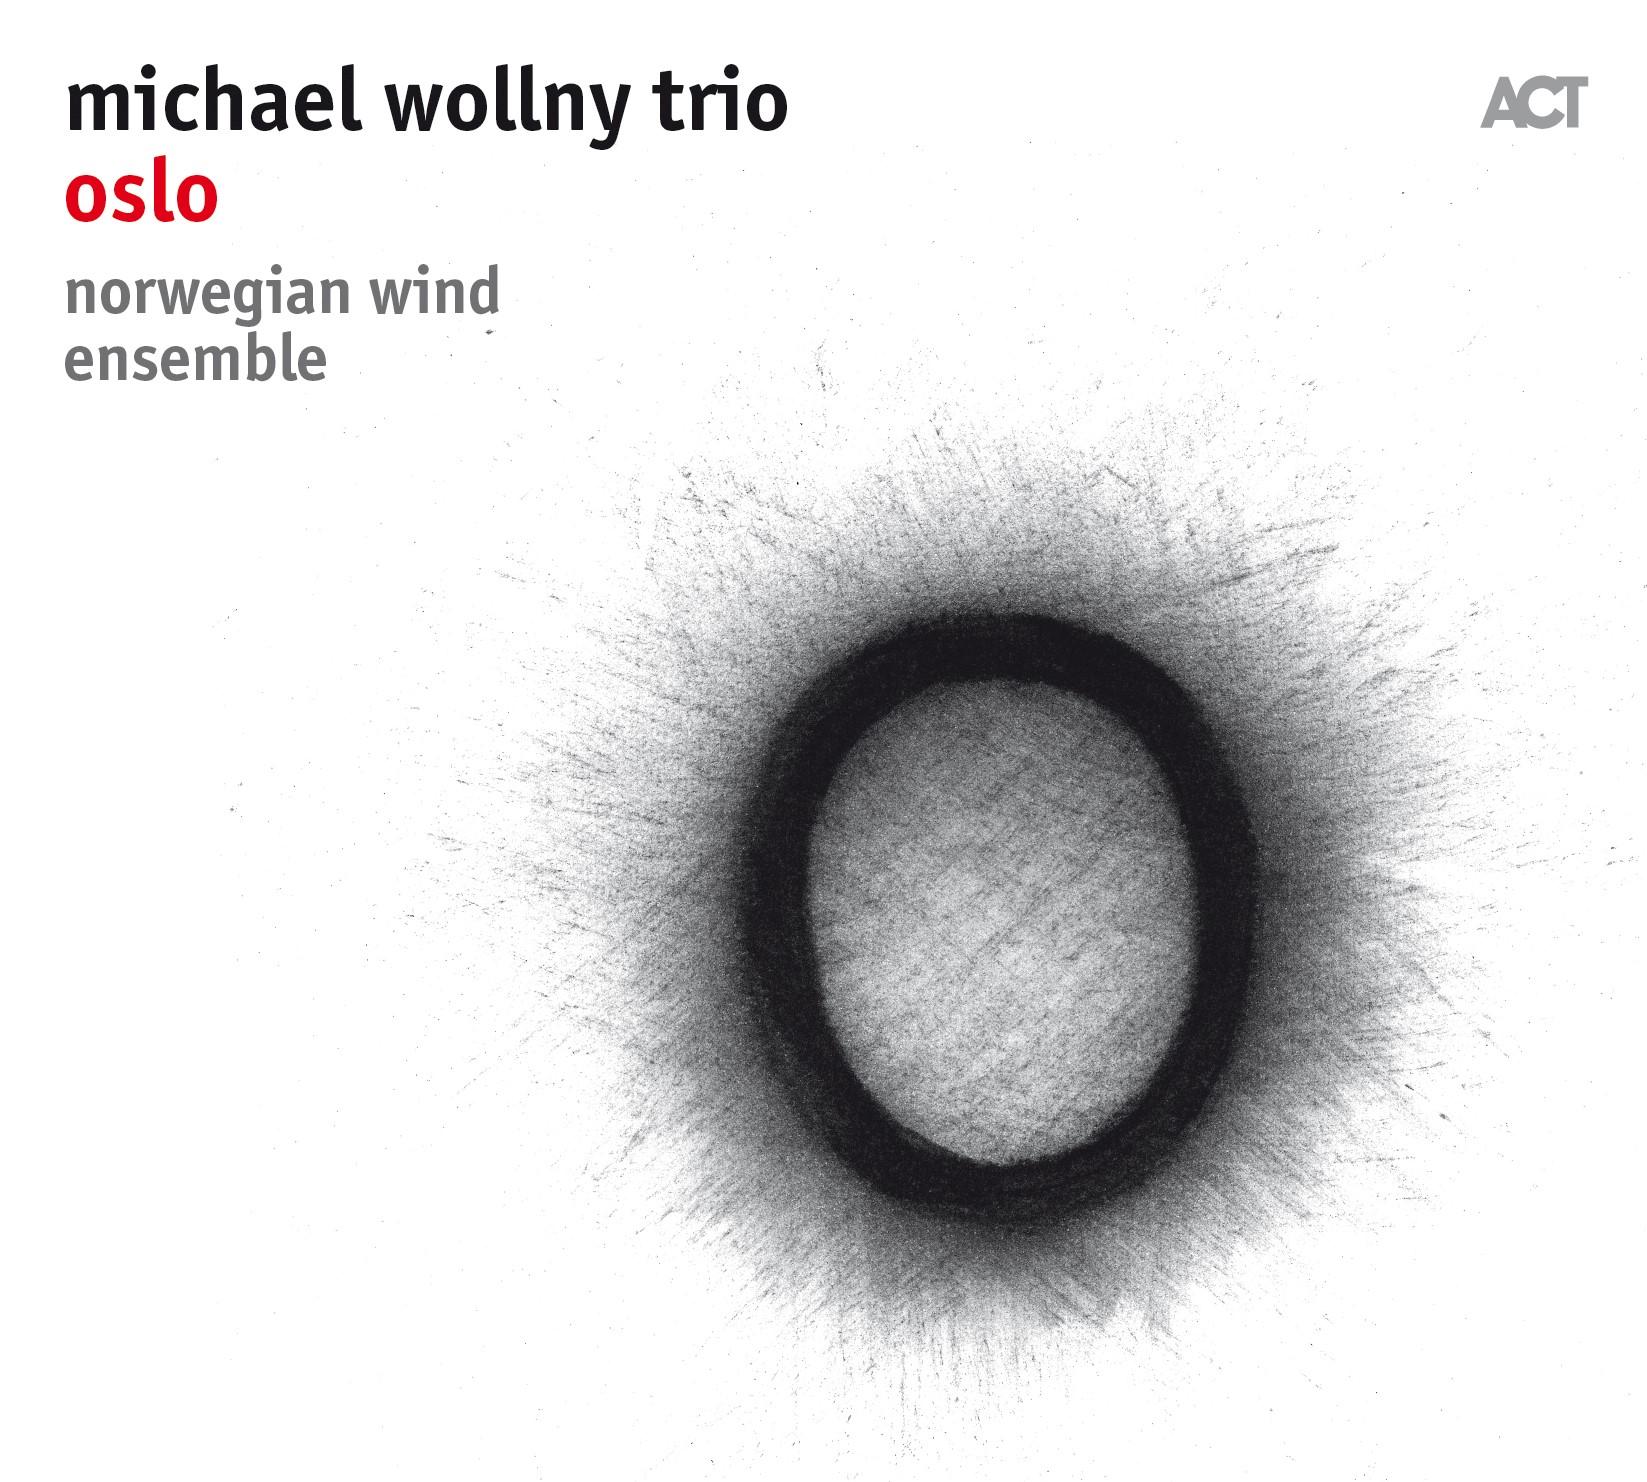 Michael Wollny</br>Oslo</br>ACT, 2018